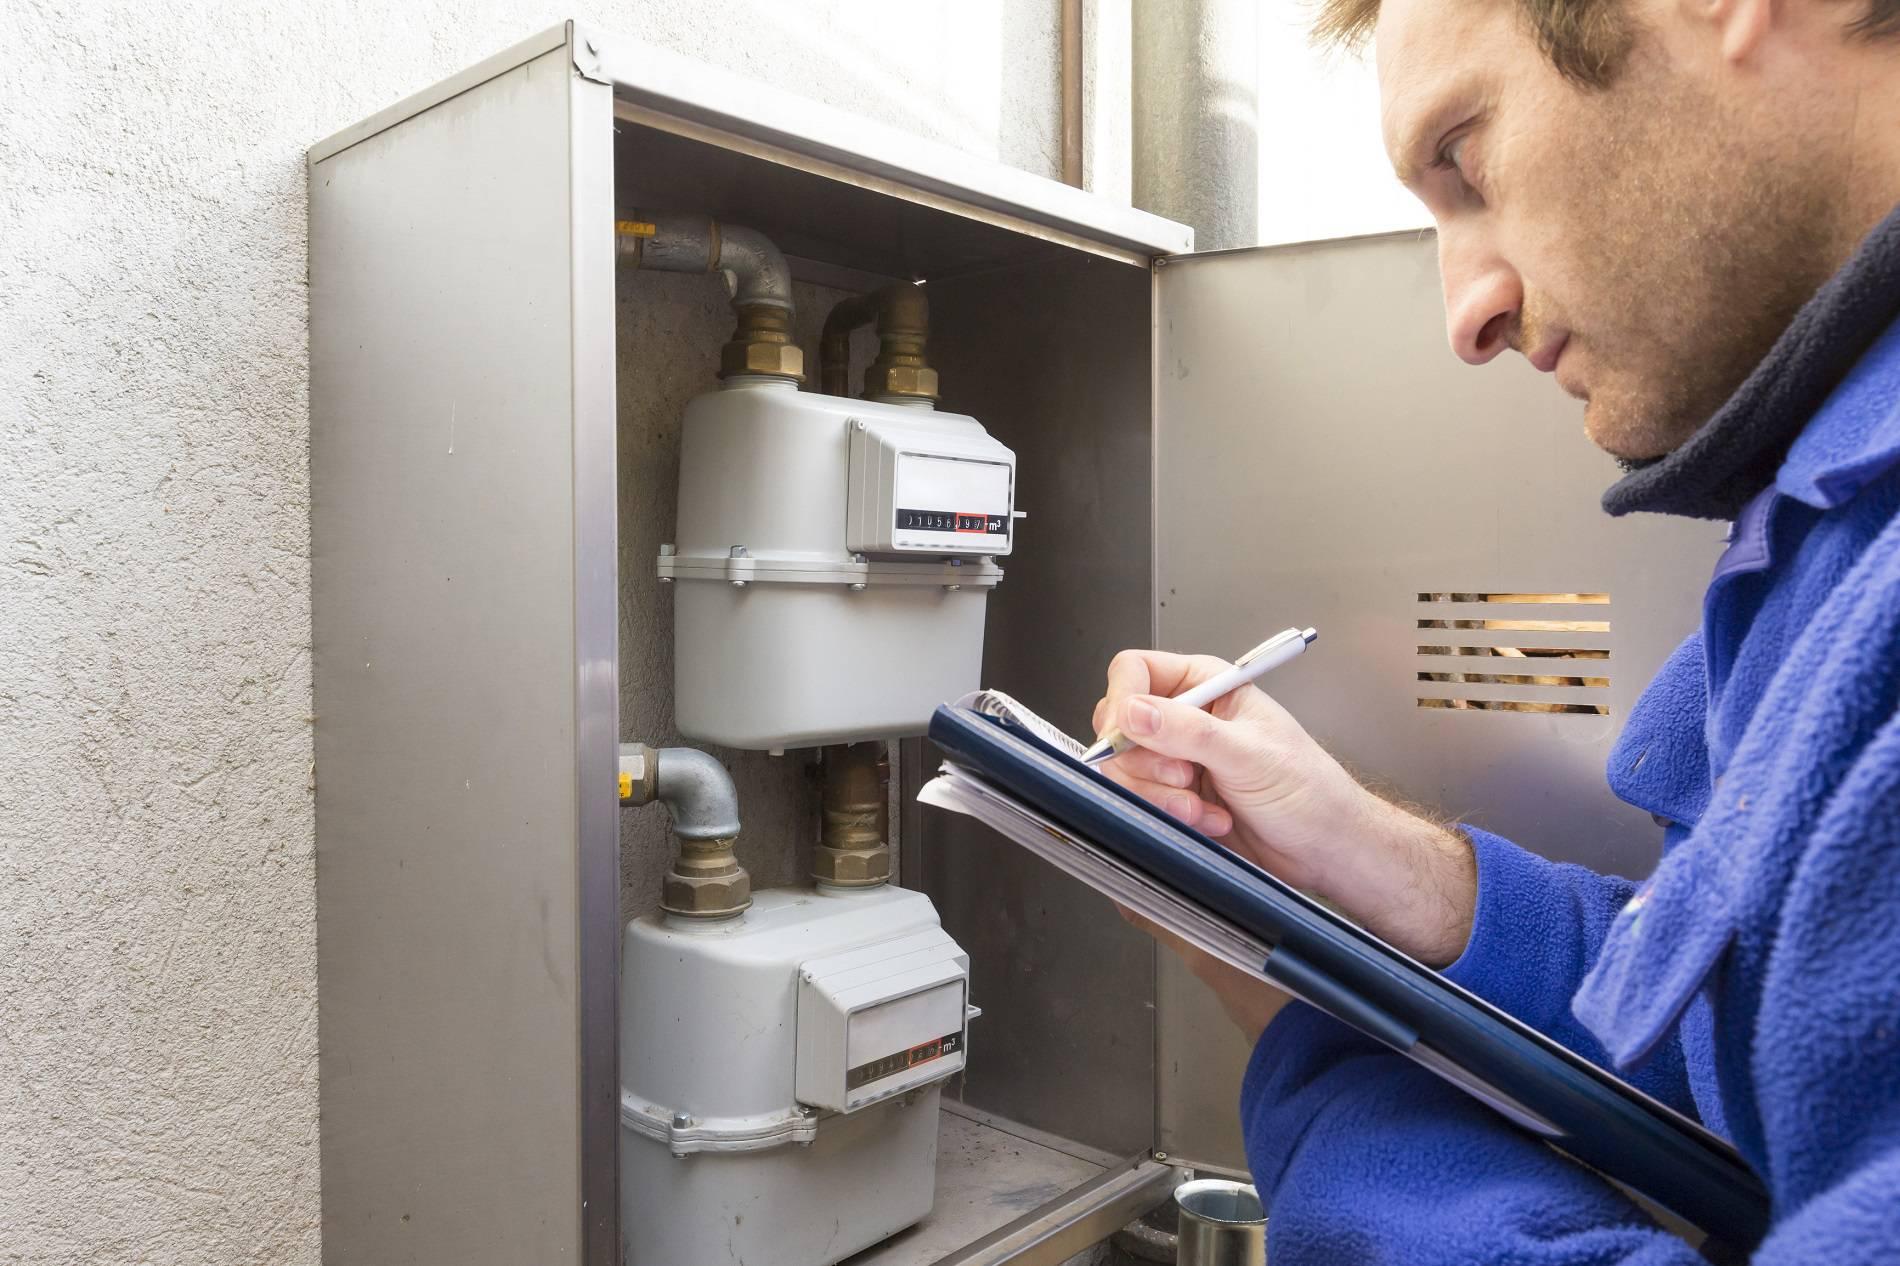 plumber at work making the consumption metering